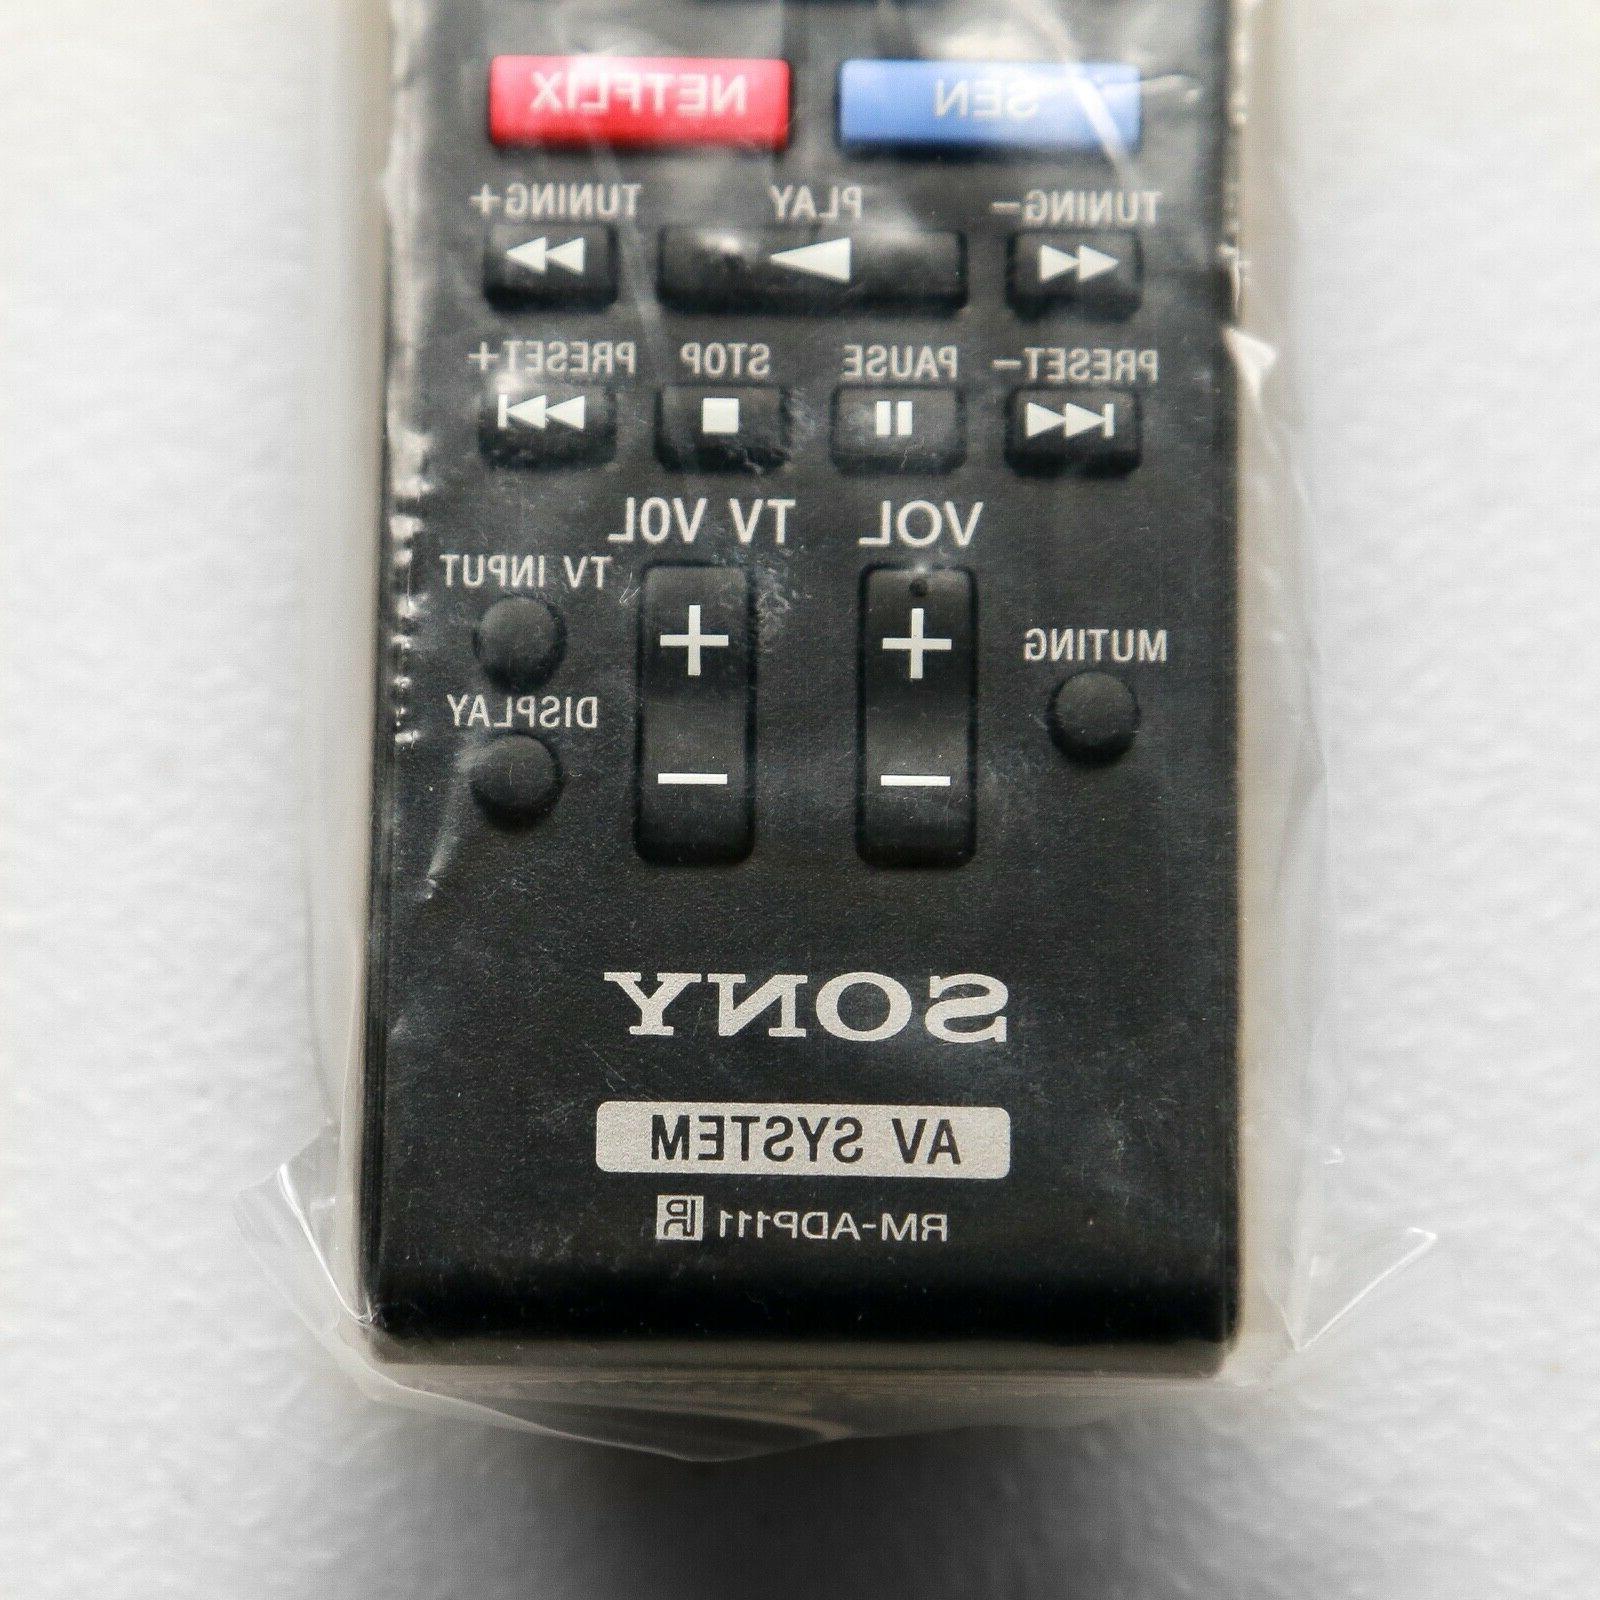 Sony control